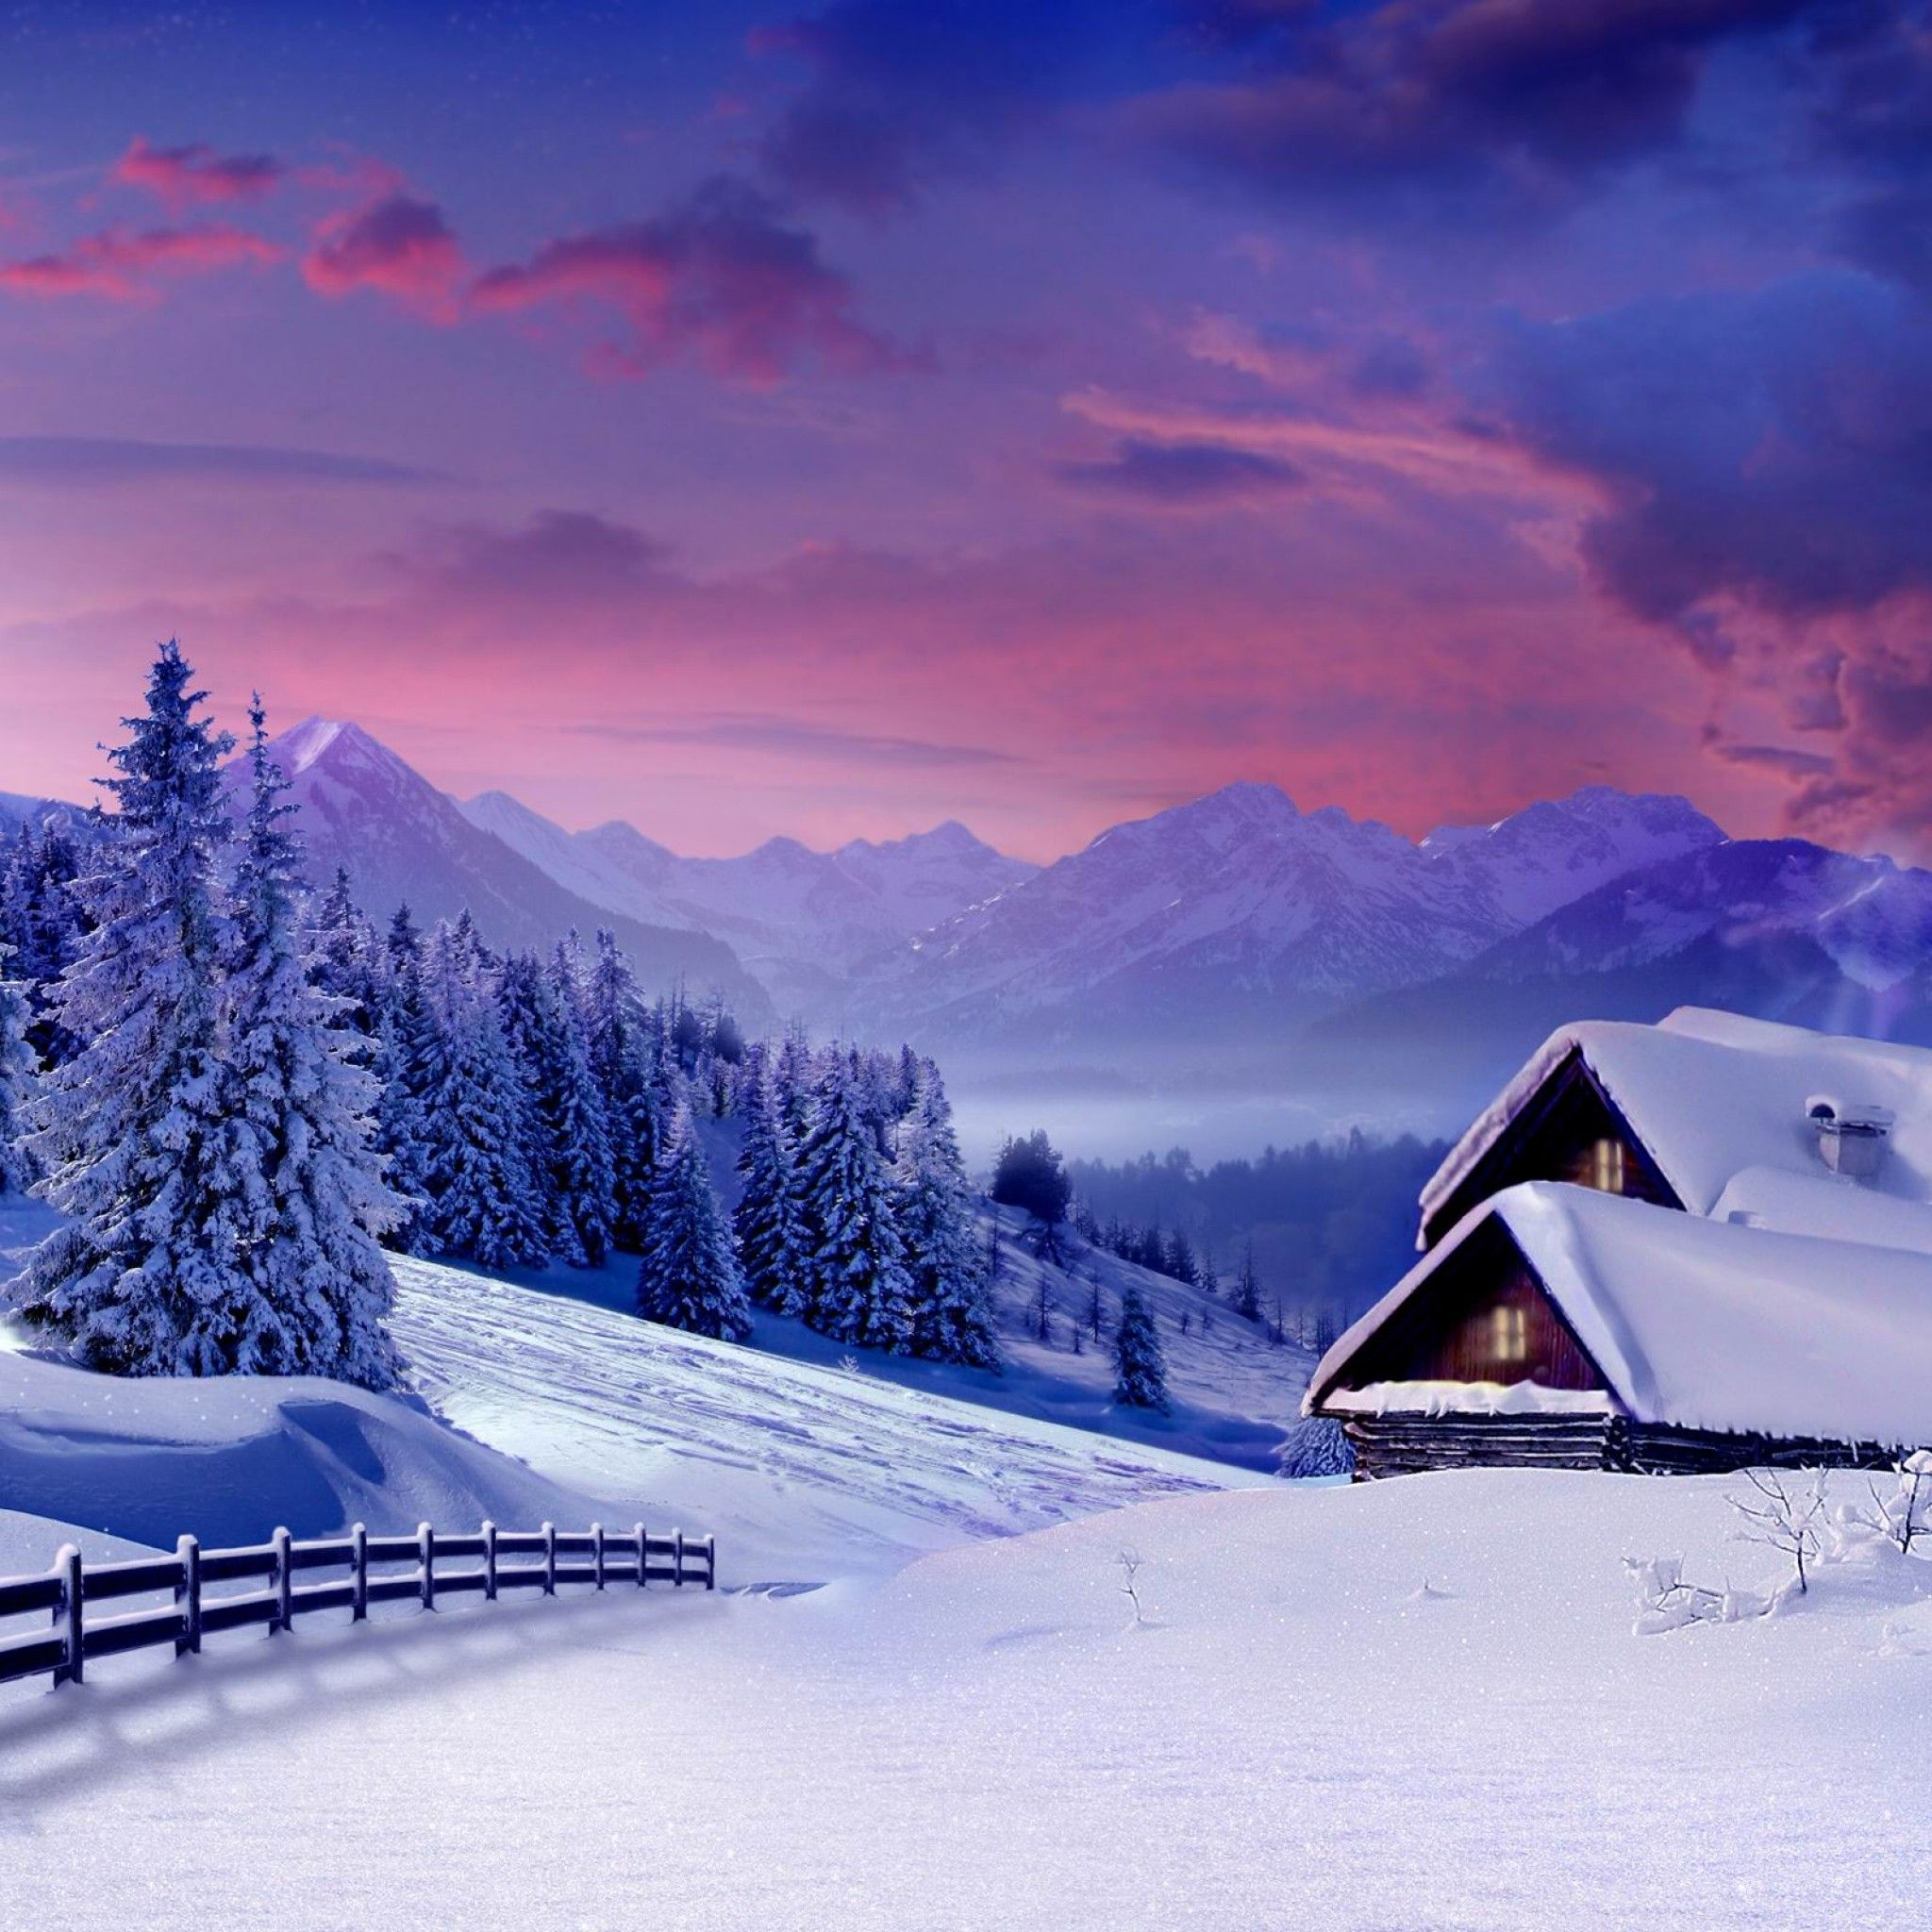 Mountain Loft Winter Ipad Wallpaper Hd Iphone Wallpaper Winter Winter Wallpaper Winter Iphone